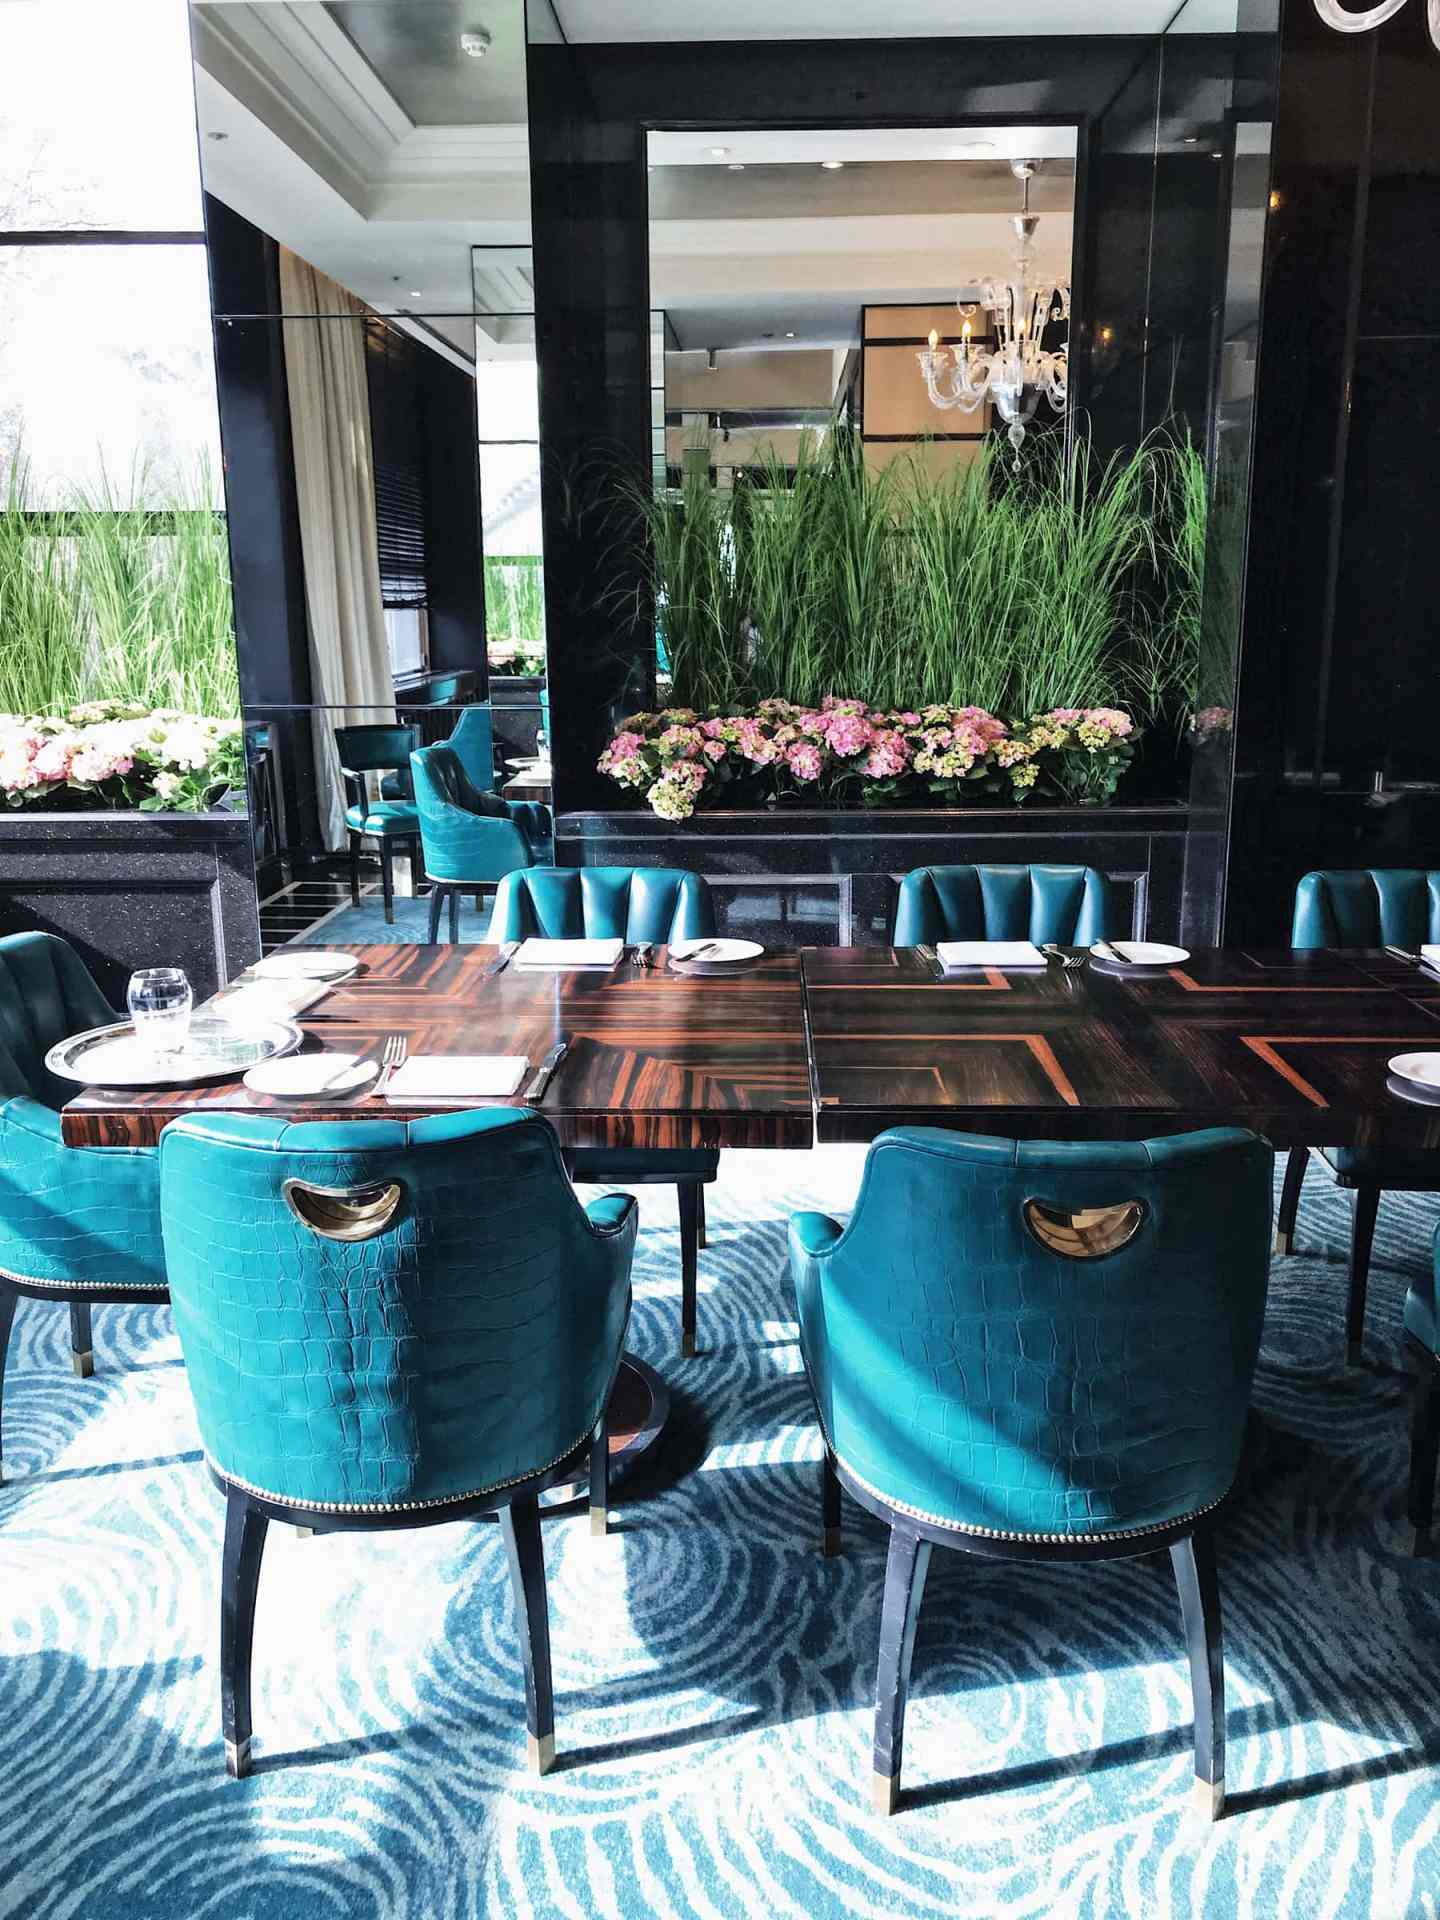 Kaspar's dining area